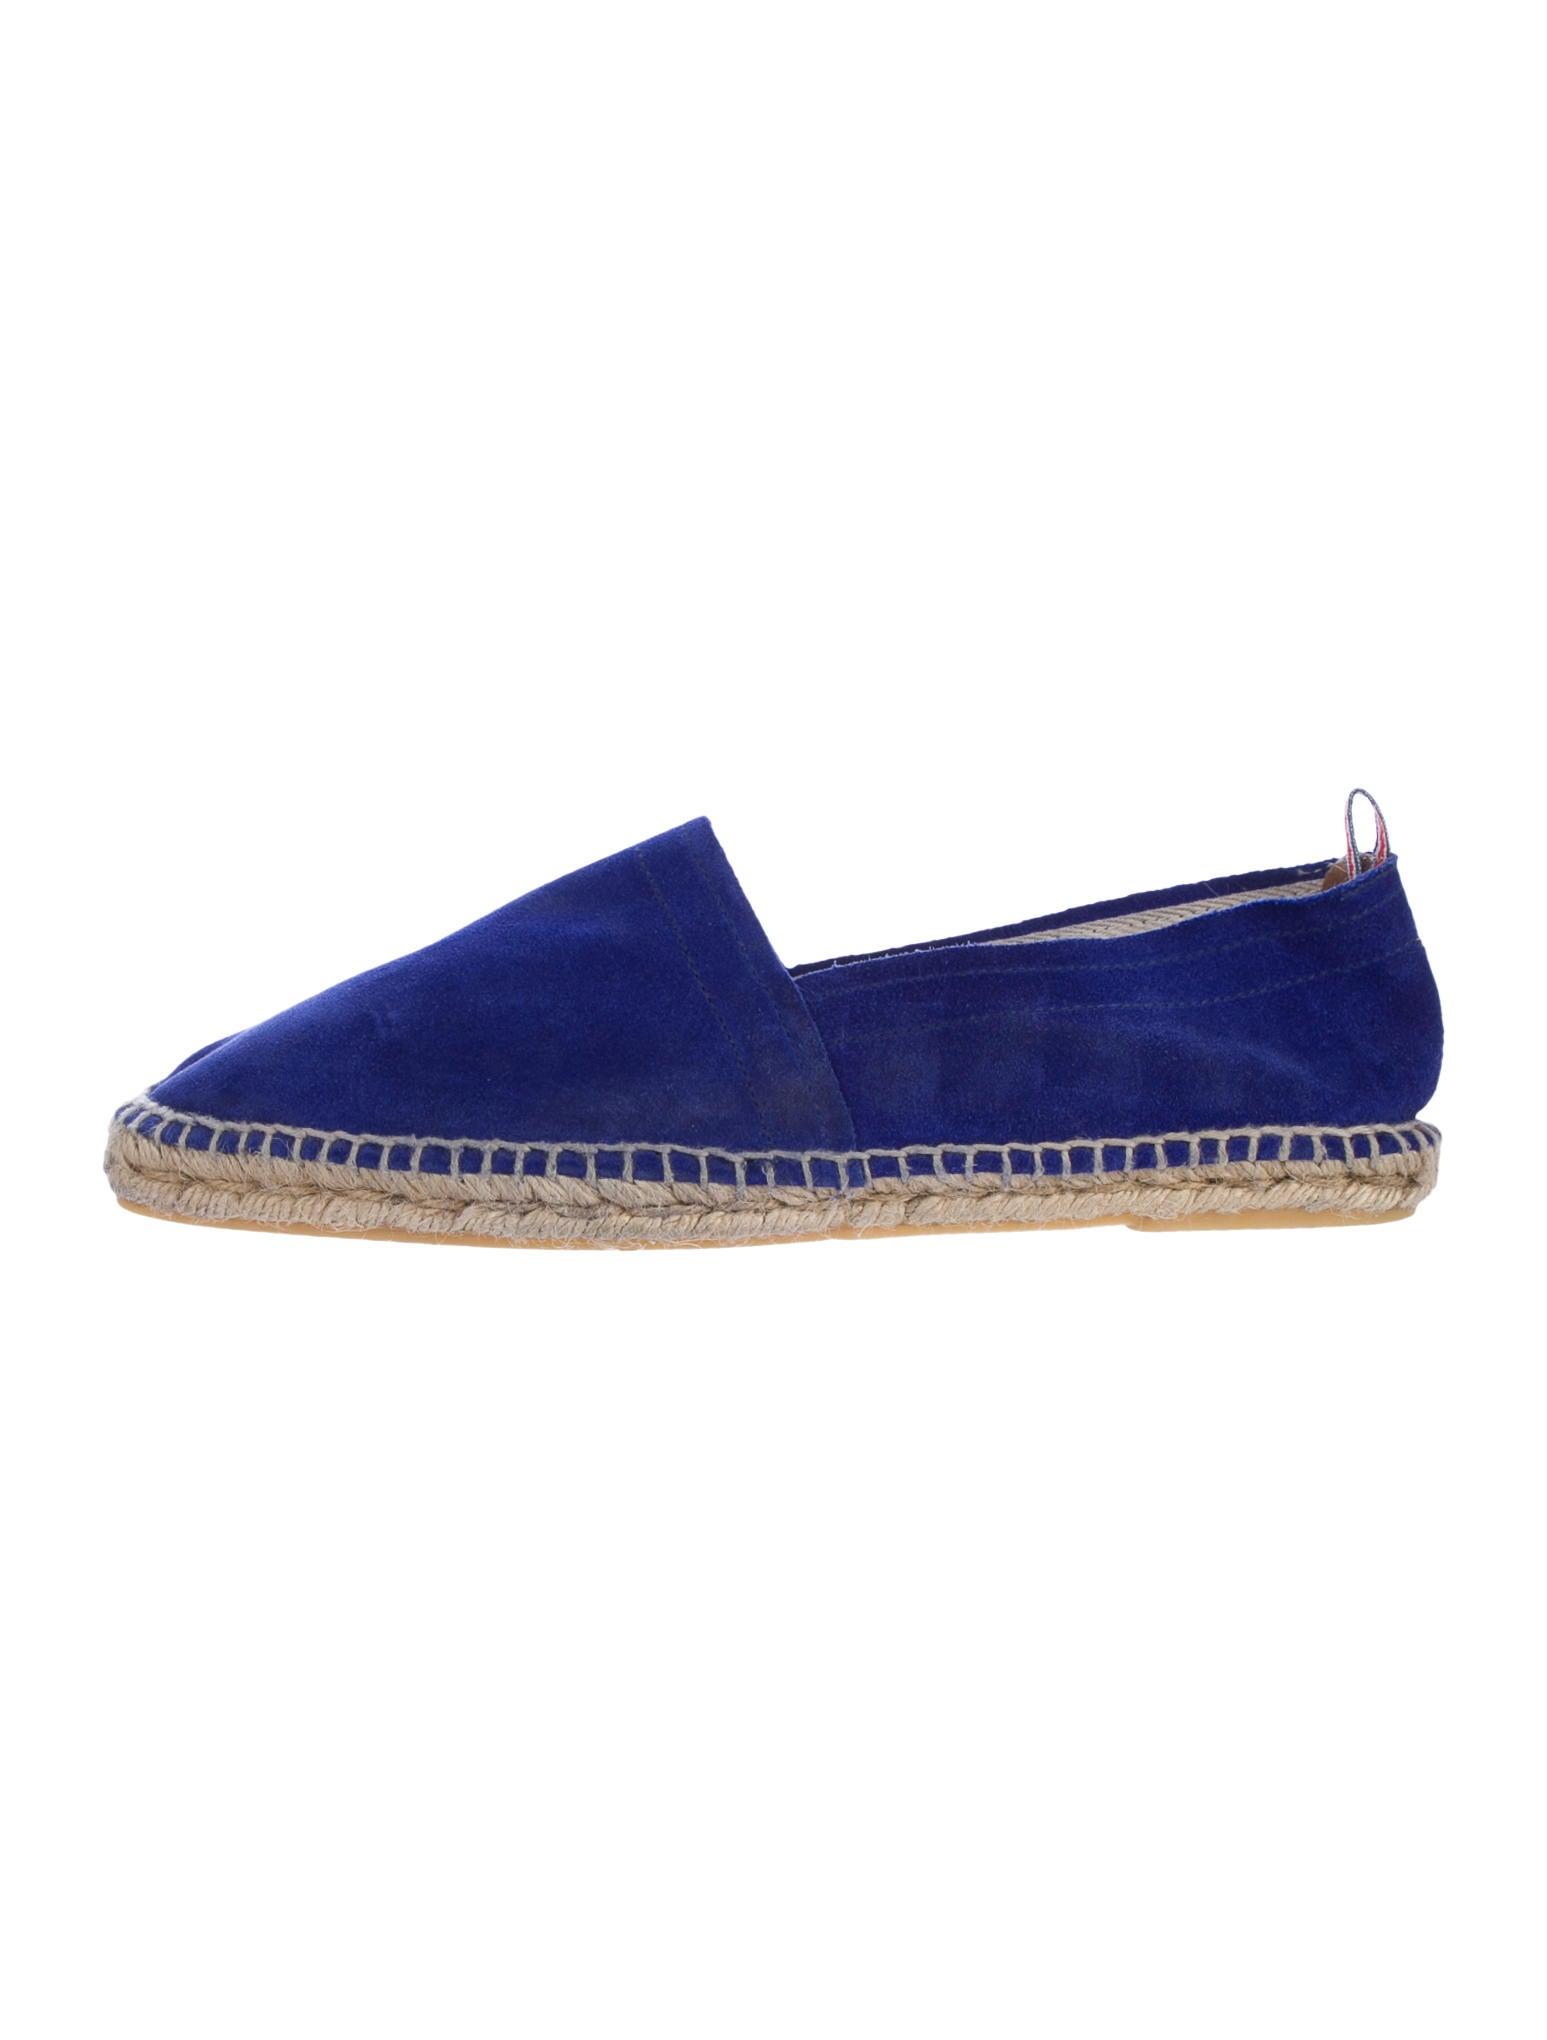 Zapatos Real Alpargatas Rxq1f Round Castaner Suede Wn820253lo Toe dxeQBoCWr